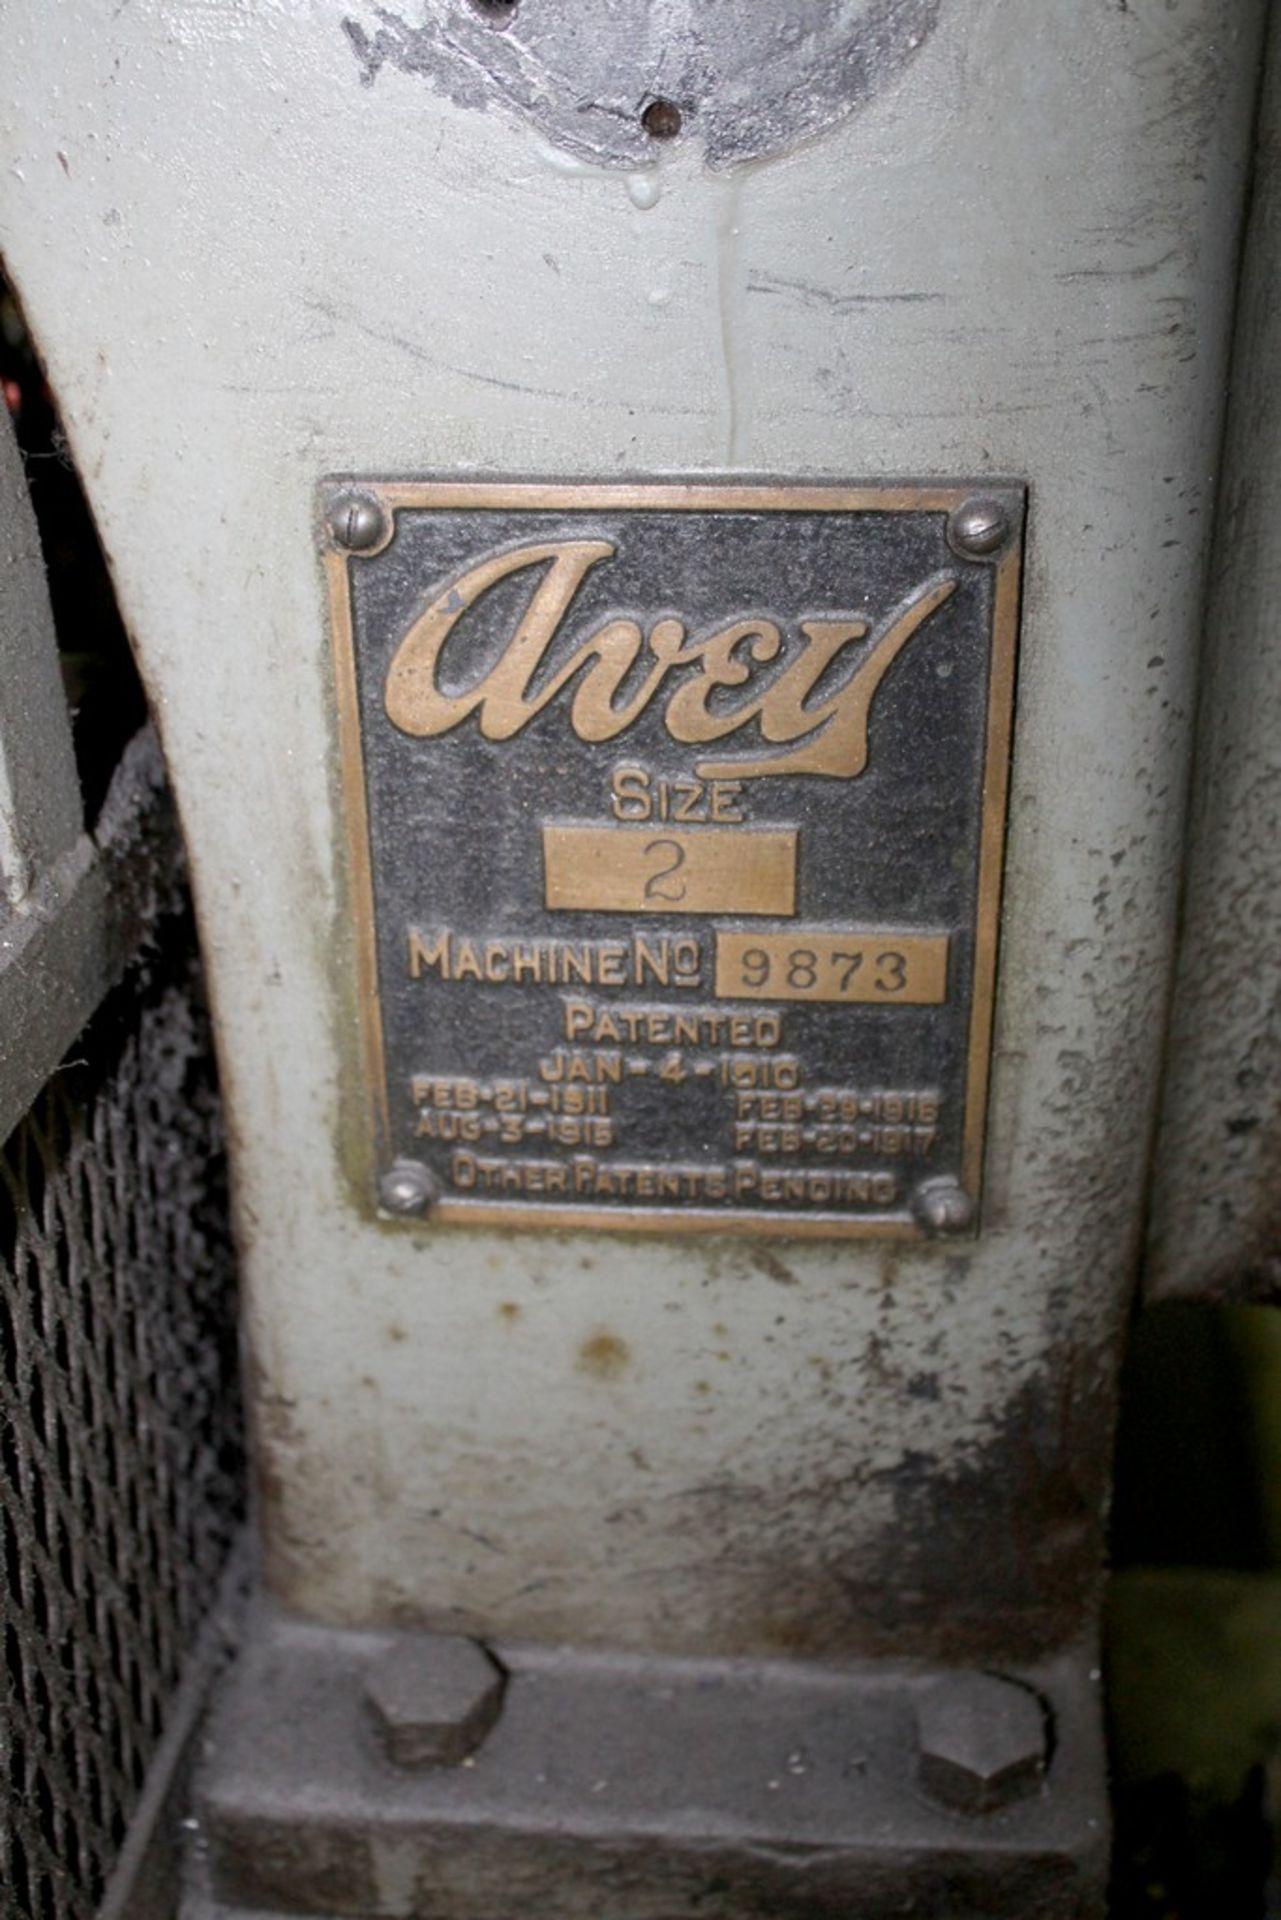 Lot 44 - AVEY SIZE 2 DRILL PRESS NO 171 S/N 9873